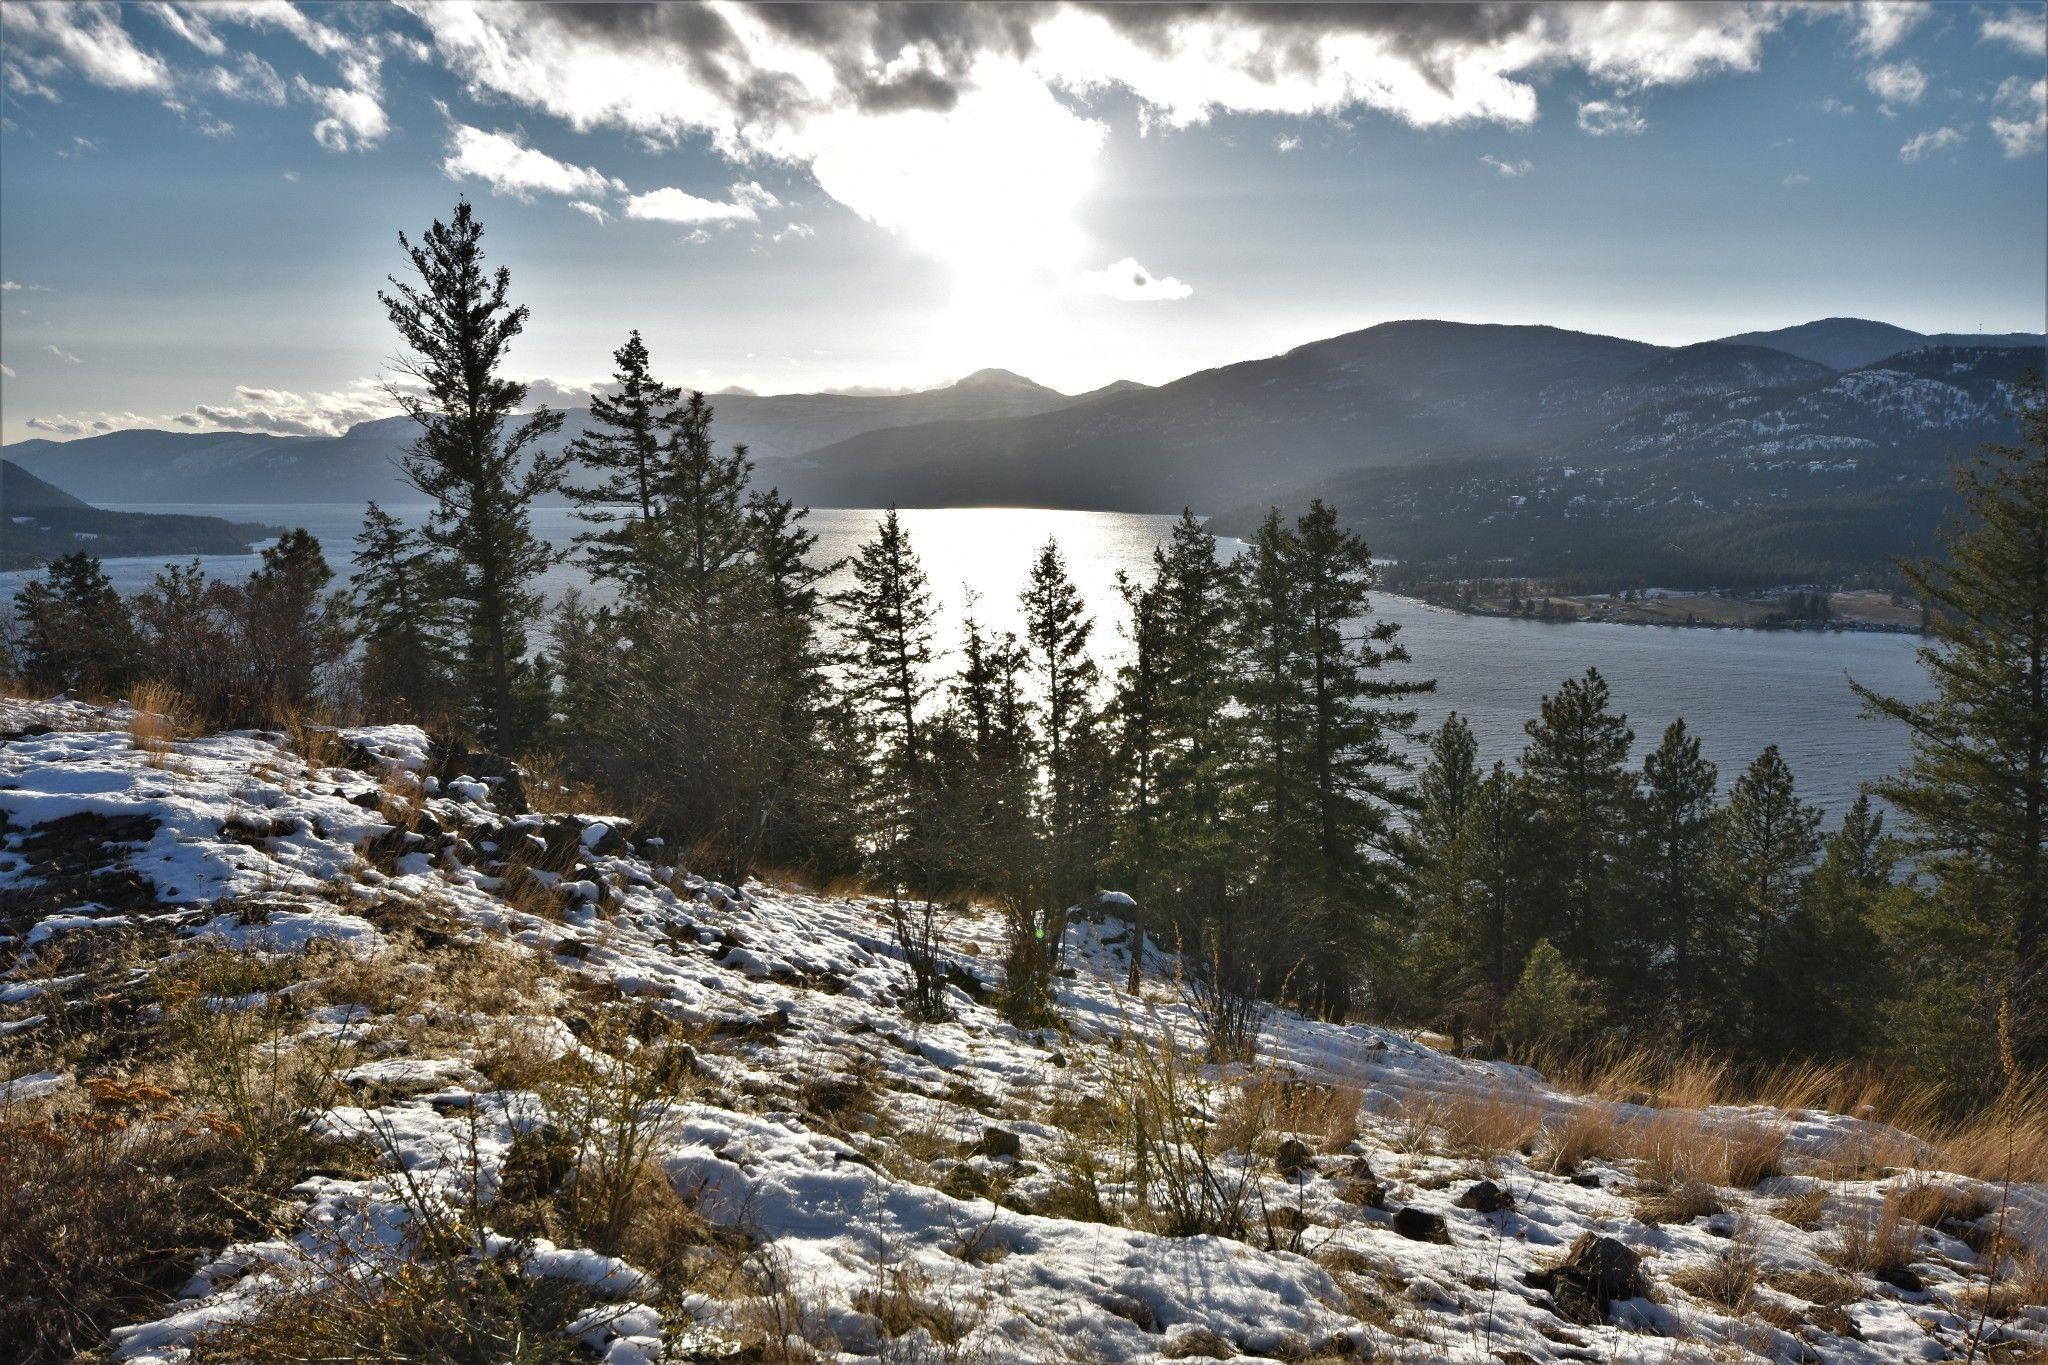 Main Photo: 9034 Tavistock Road in Vernon: Adventure Bay Vacant Land for sale (North Okanagan)  : MLS®# 10218951